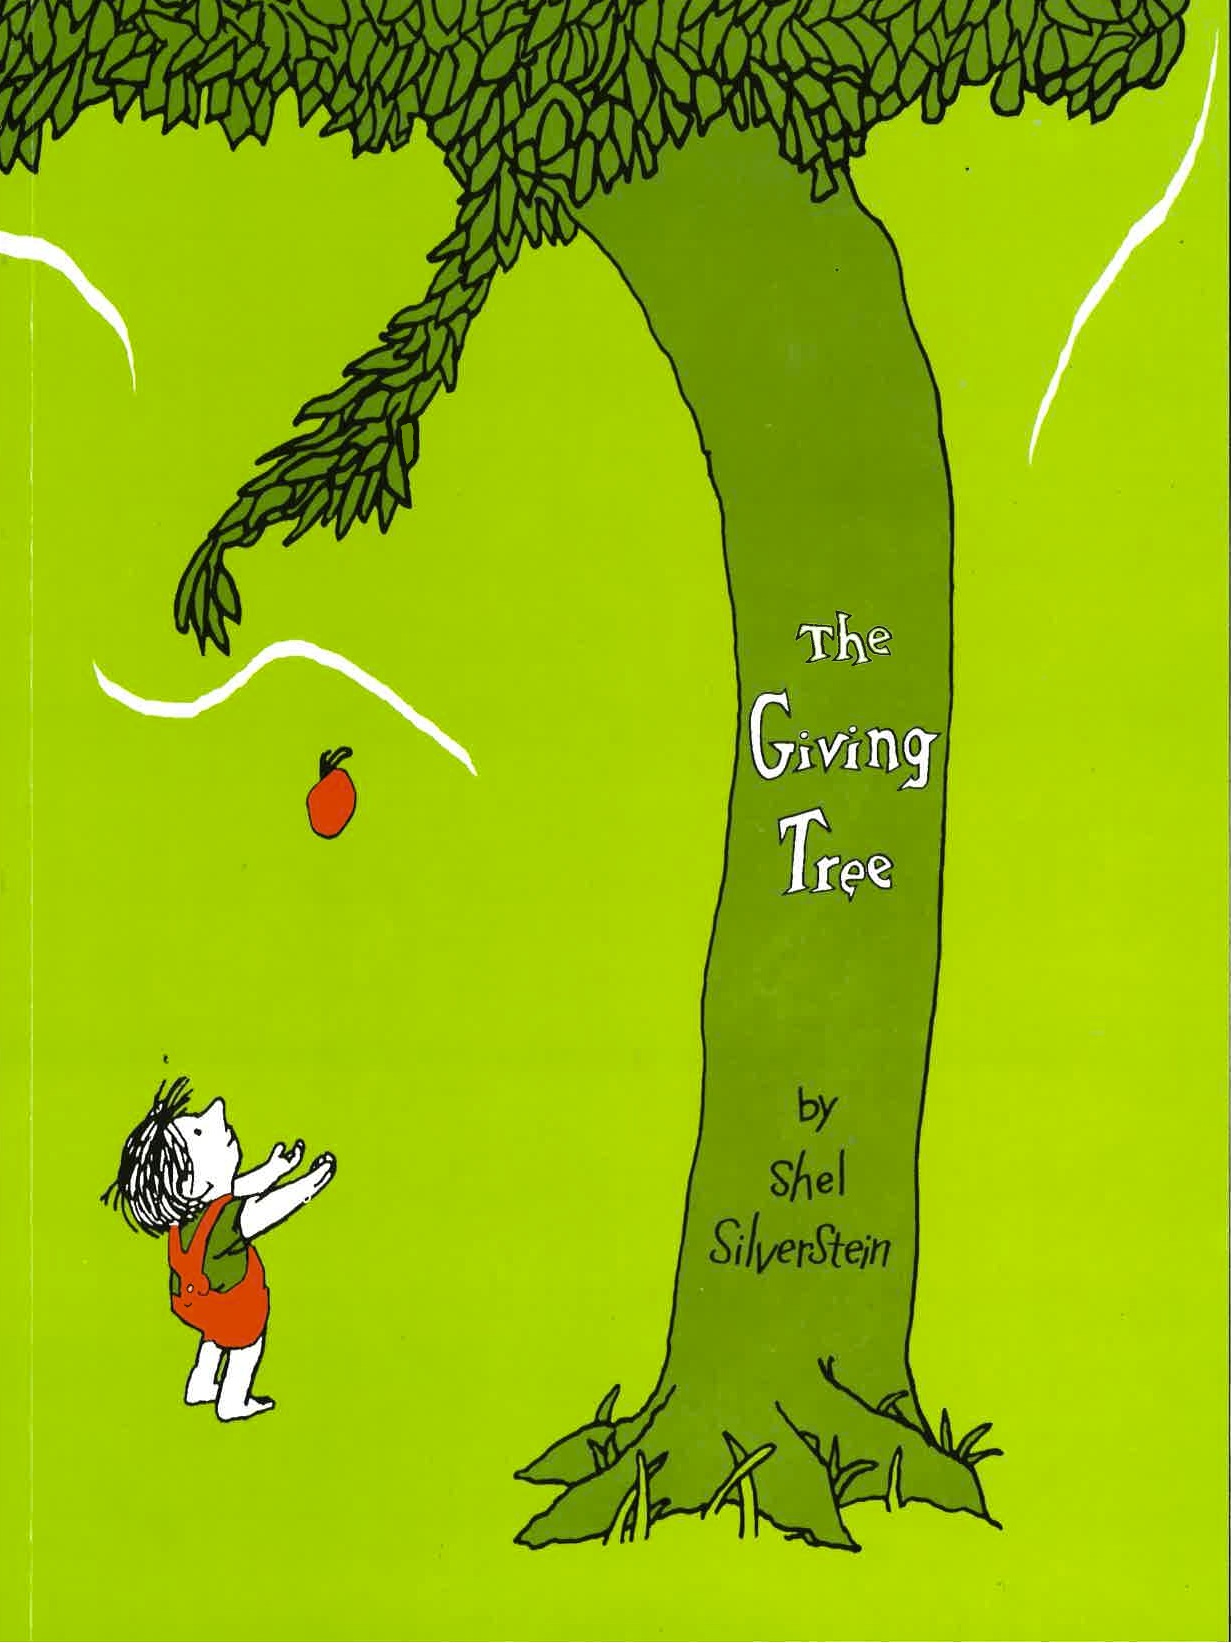 5 giving tree_001.jpg